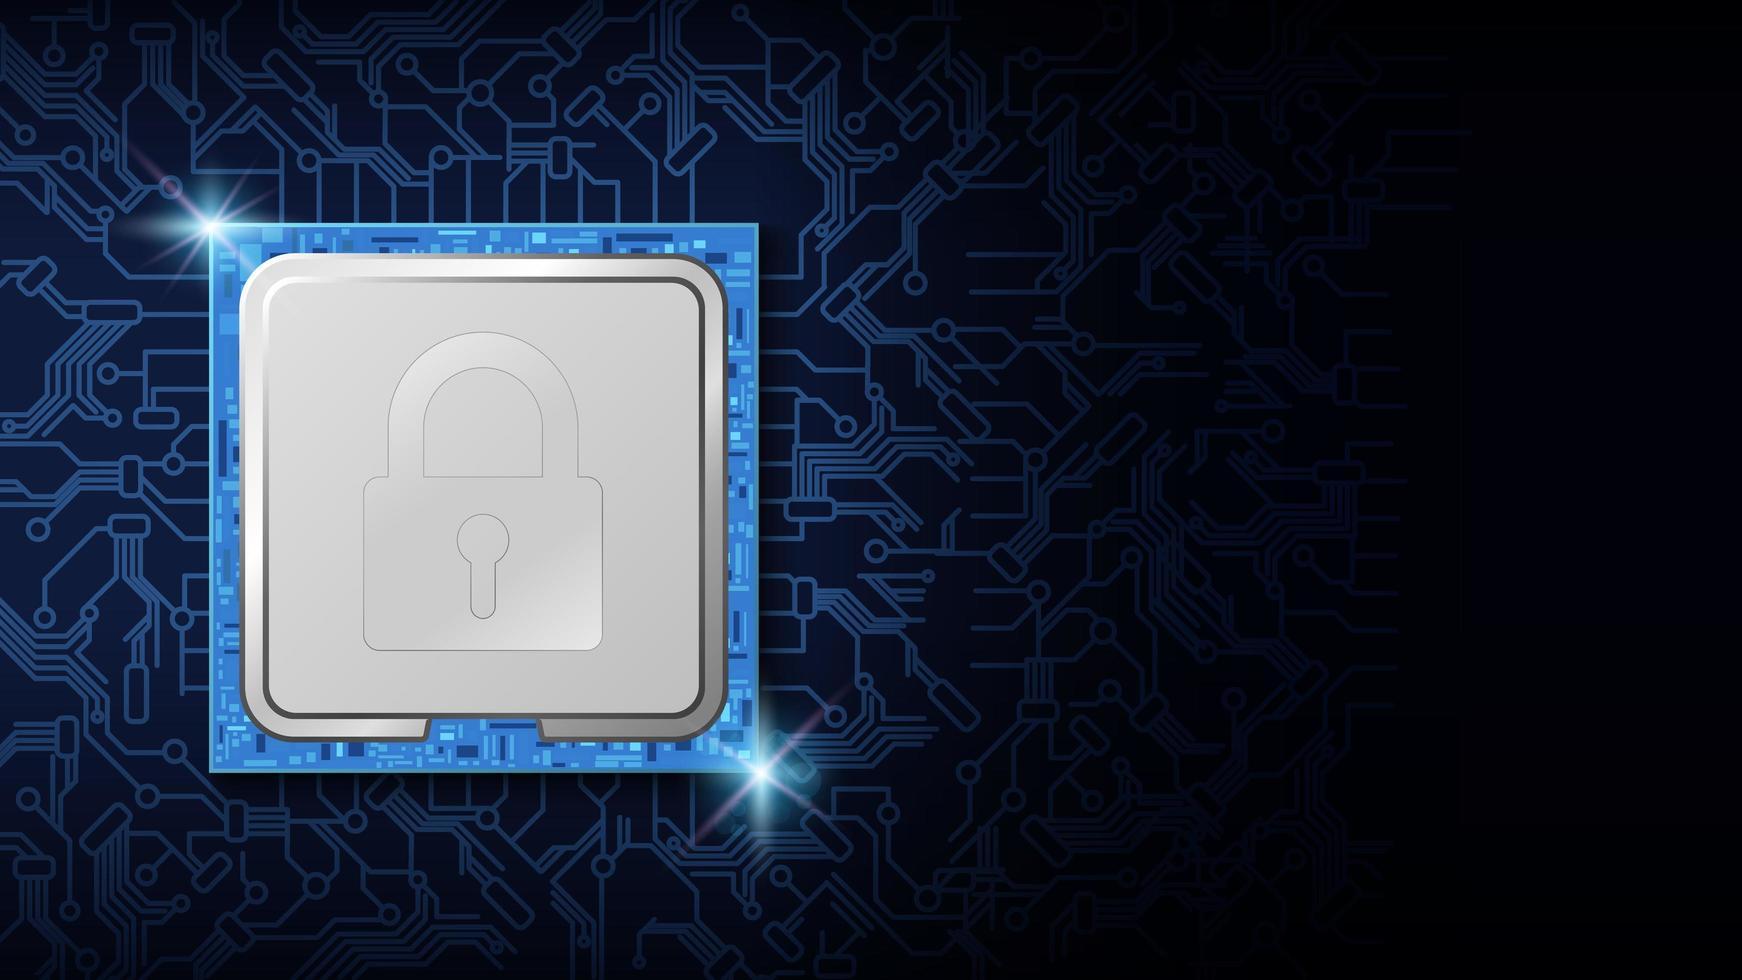 cyberveiligheidsslot op cpu-chip elektronisch ontwerp vector